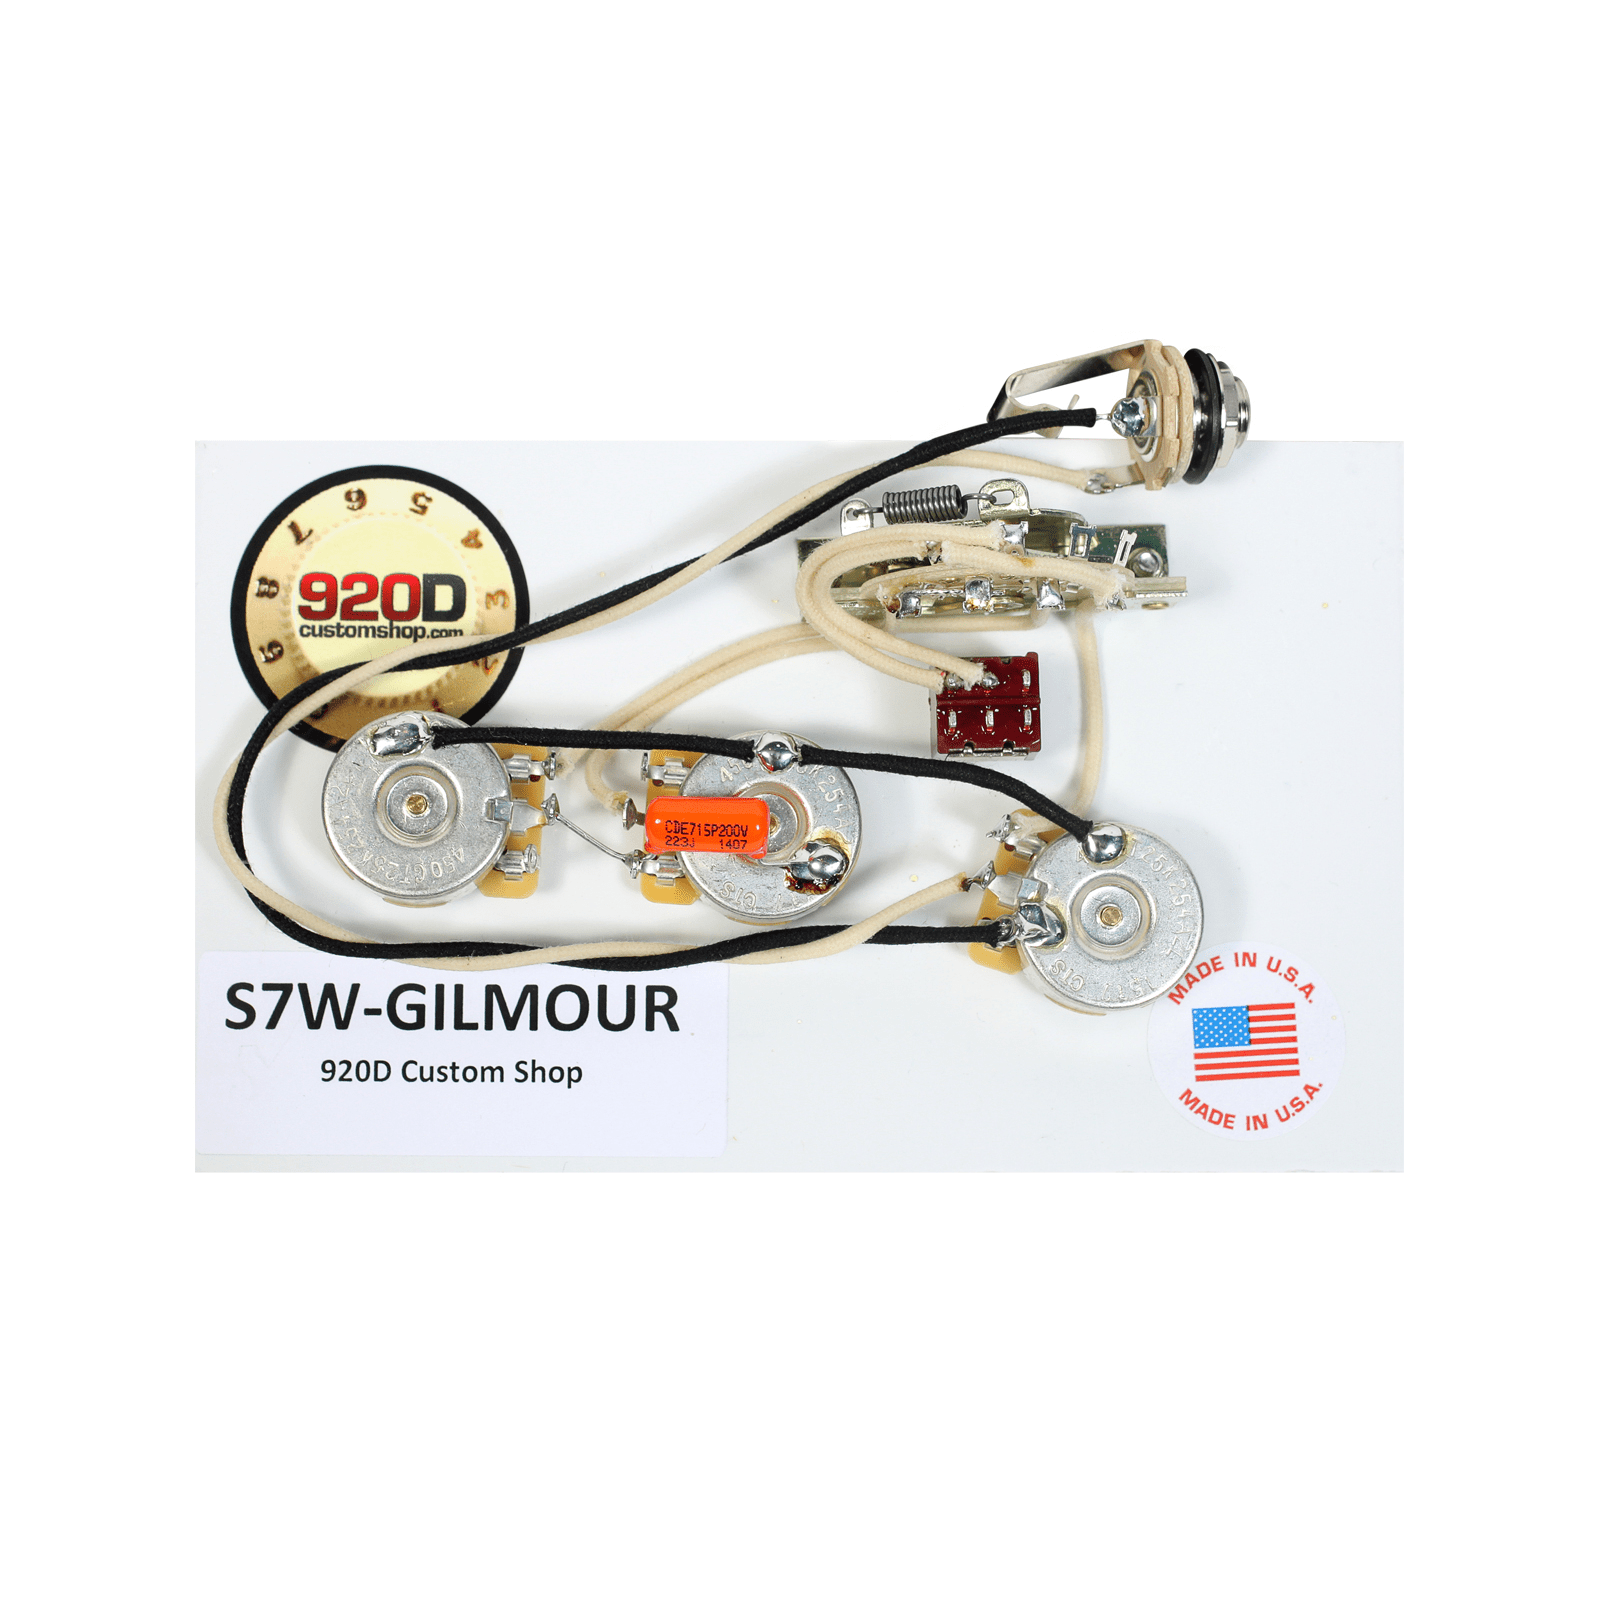 small resolution of fender strat stratocaster david gilmour 7 way wiring harness mini fender strat stratocaster david gilmour 7